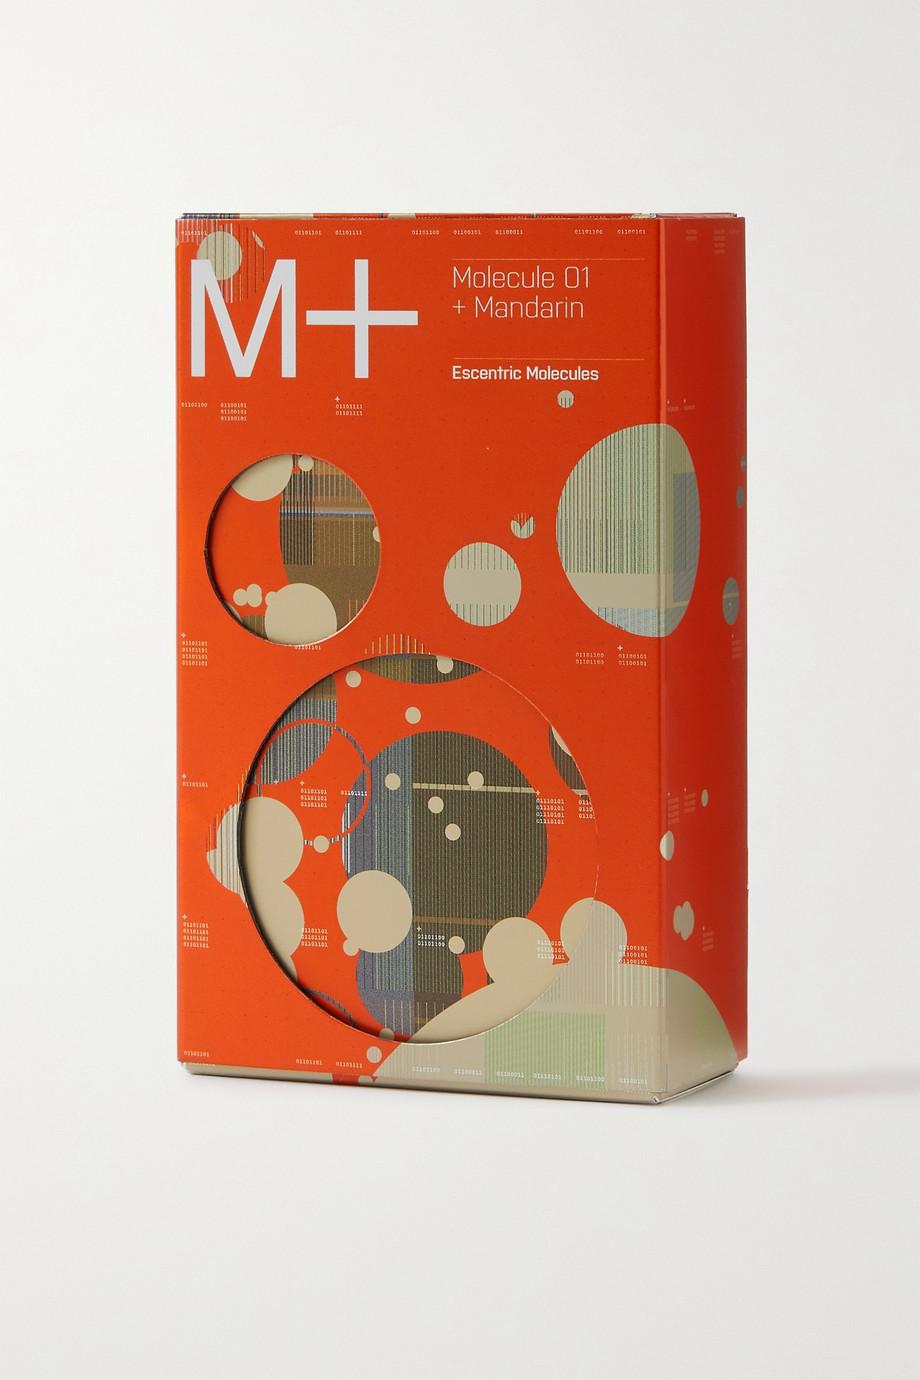 Escentric Molecules Eau de toilette Molecule 01, Mandarin, 100 ml